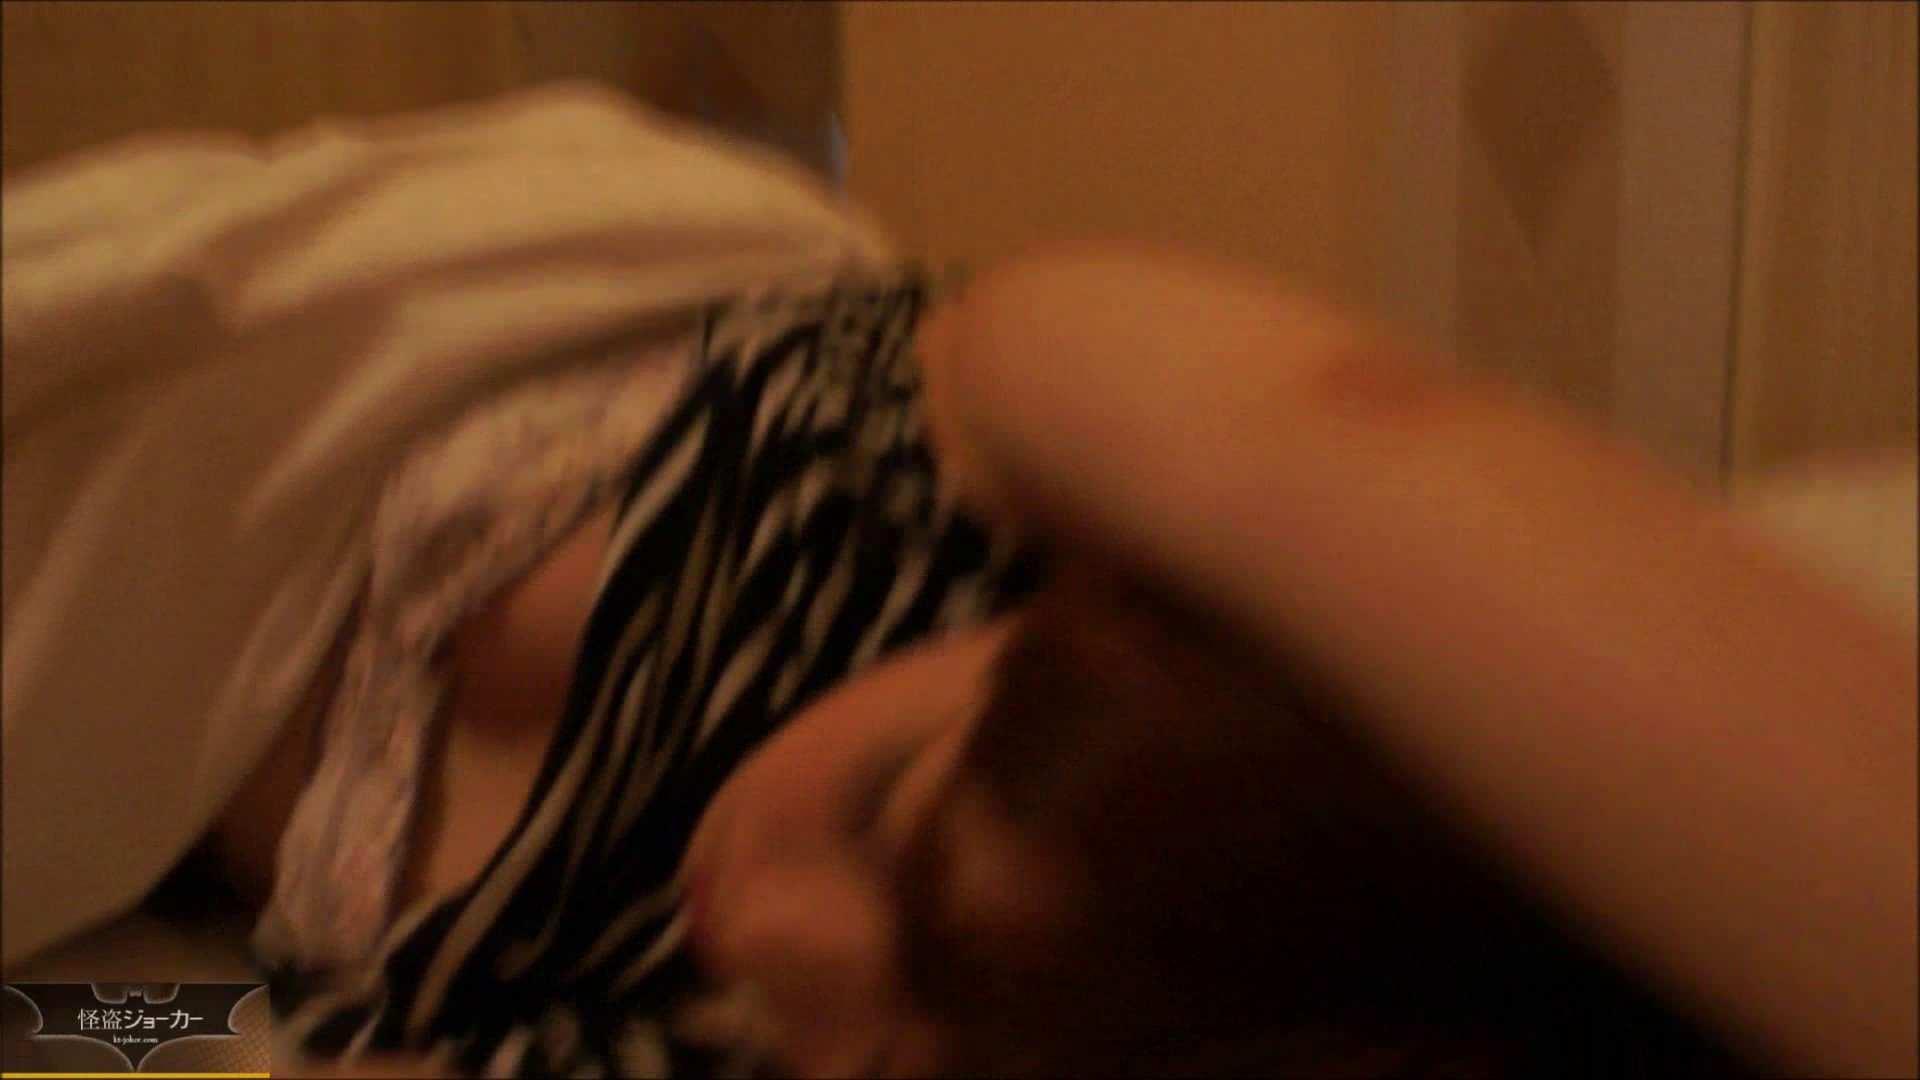 vol.4【白衣の天使23歳】☆のりこちゃん☆ホテルお持ち帰り。朦朧のまま感じて セックス ワレメ無修正動画無料 109画像 56